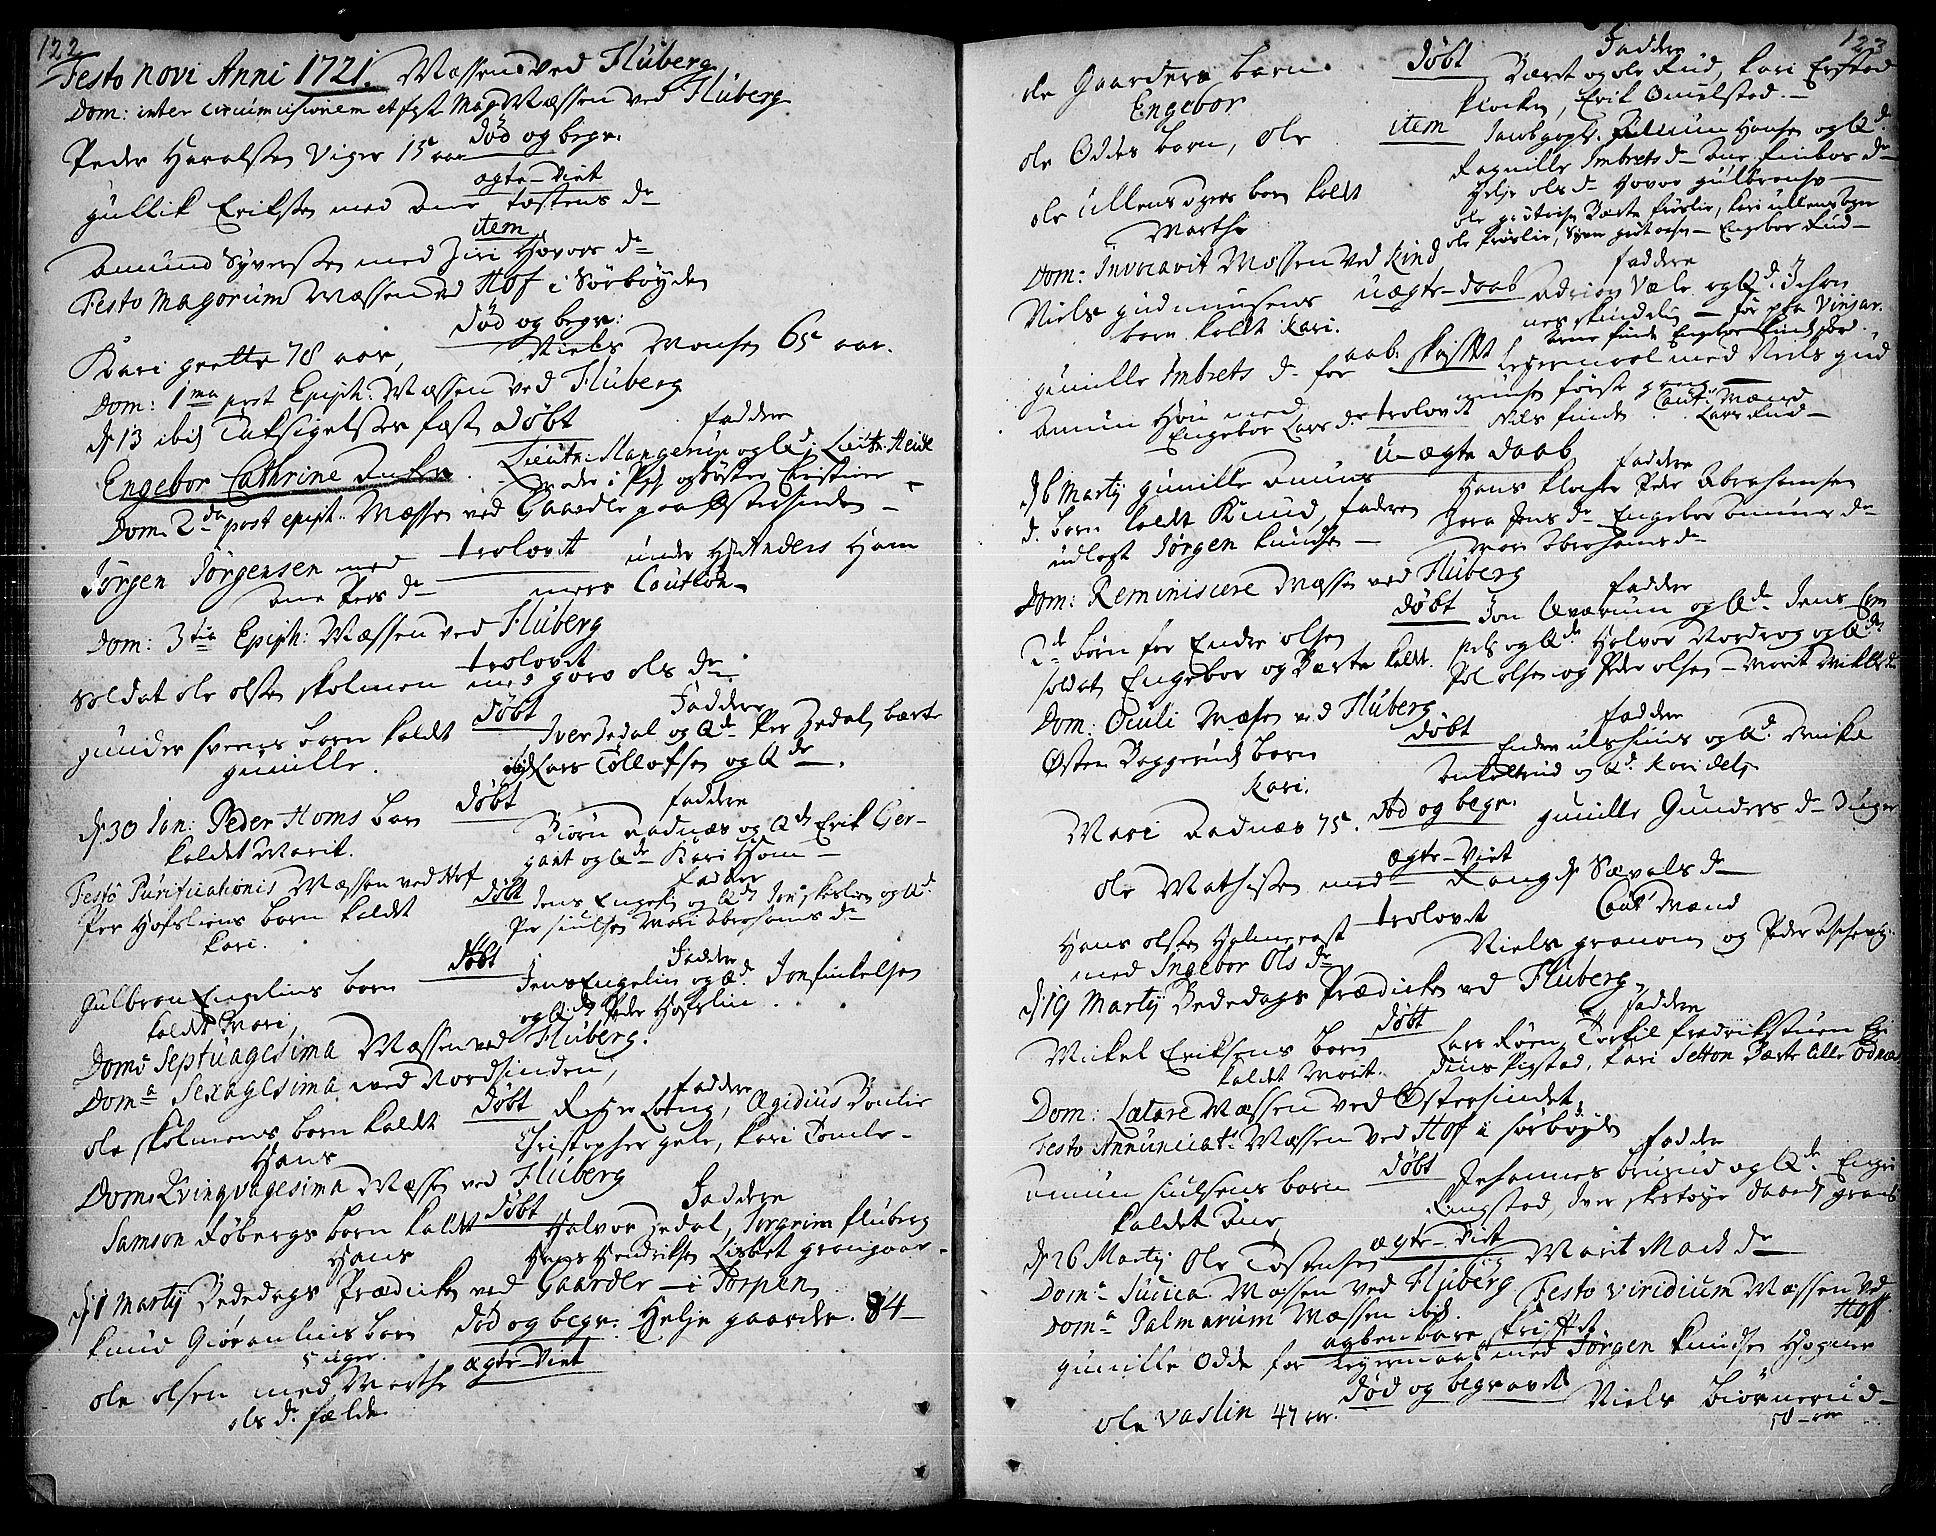 SAH, Land prestekontor, Ministerialbok nr. 1, 1708-1732, s. 122-123